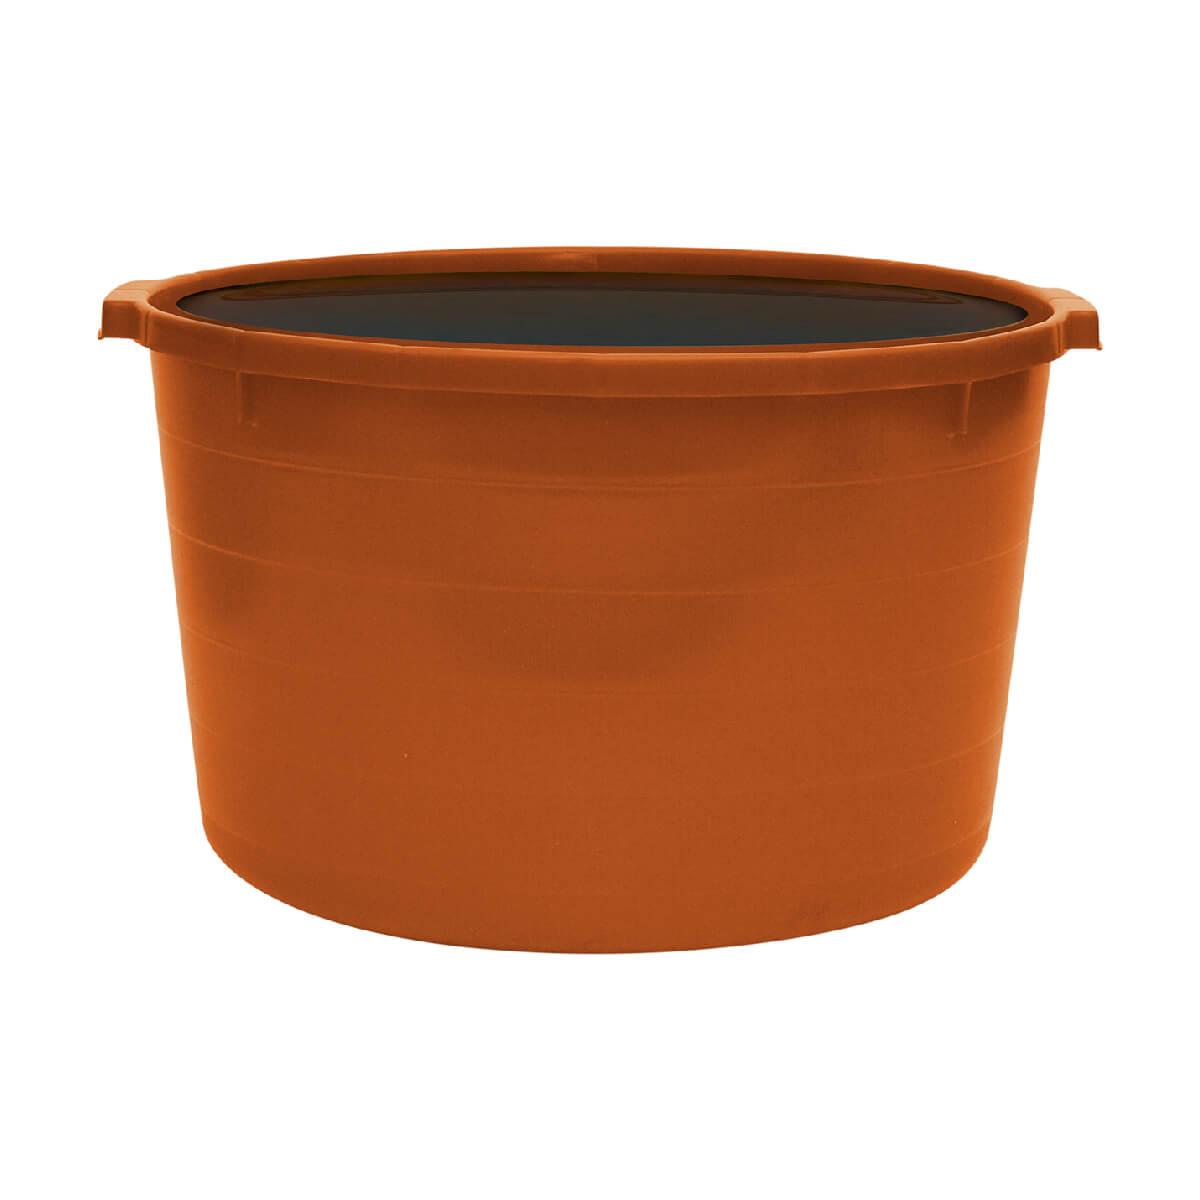 Prostock Tub - Orange - 16% - 113 kg